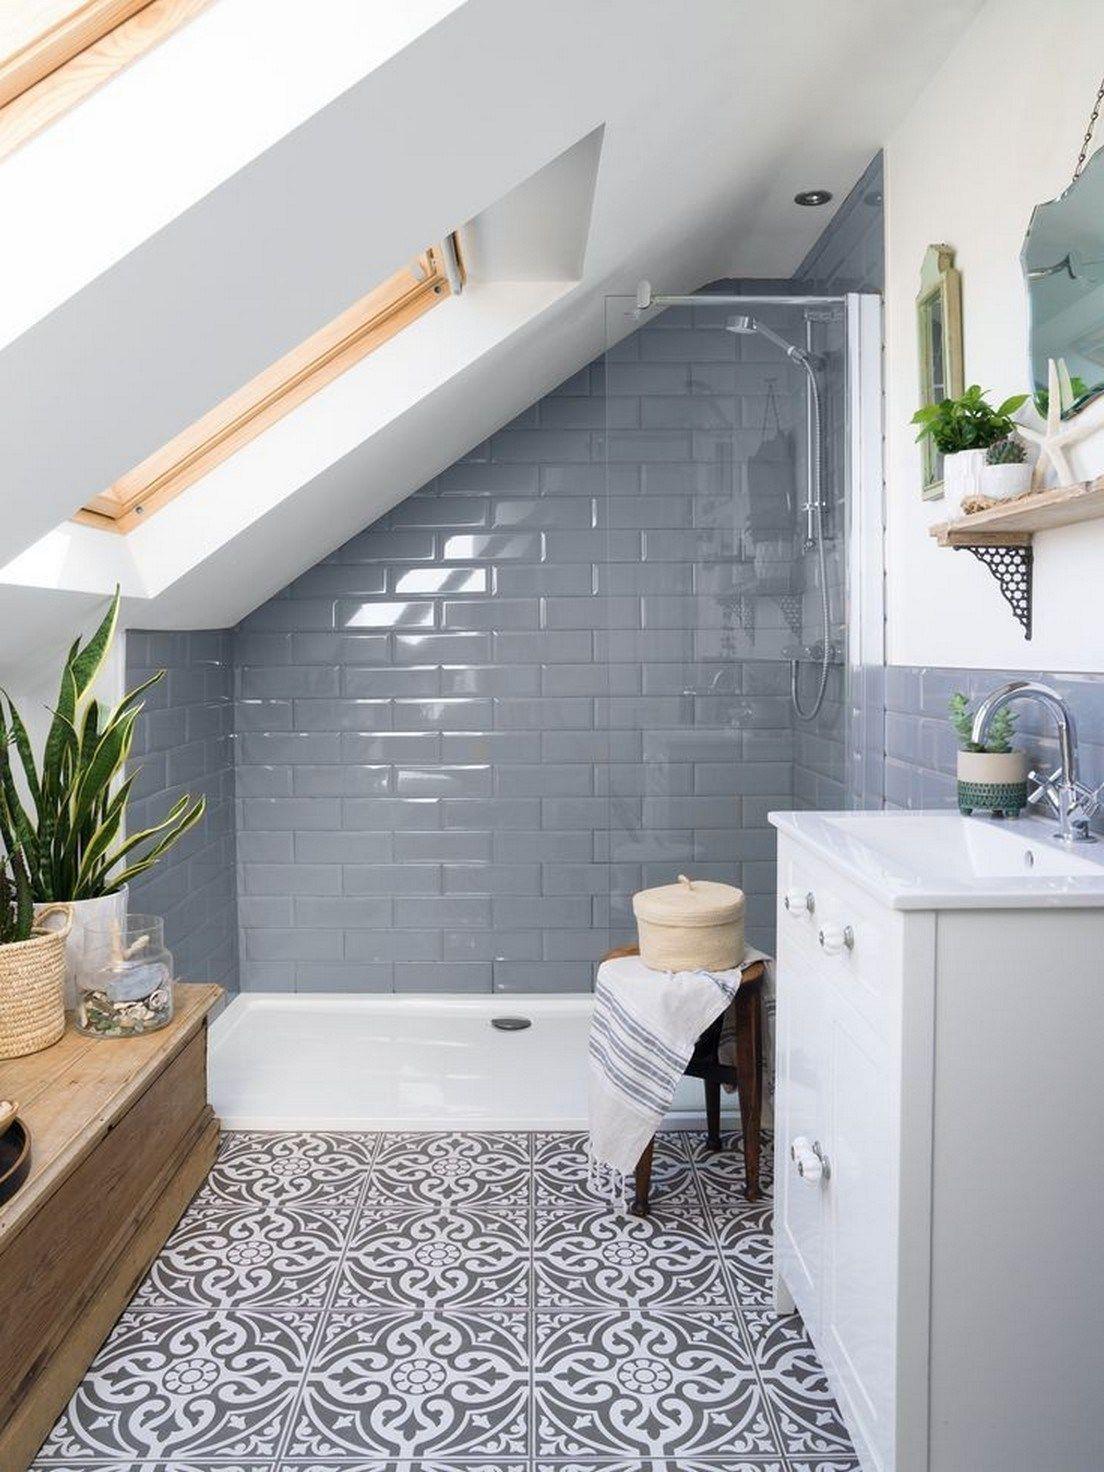 27 Bathrooms With Clever Ideas 64 Weddingdresses Uniqueweddingdresses Loft Conversion Bedroom Loft Bathroom Loft Room